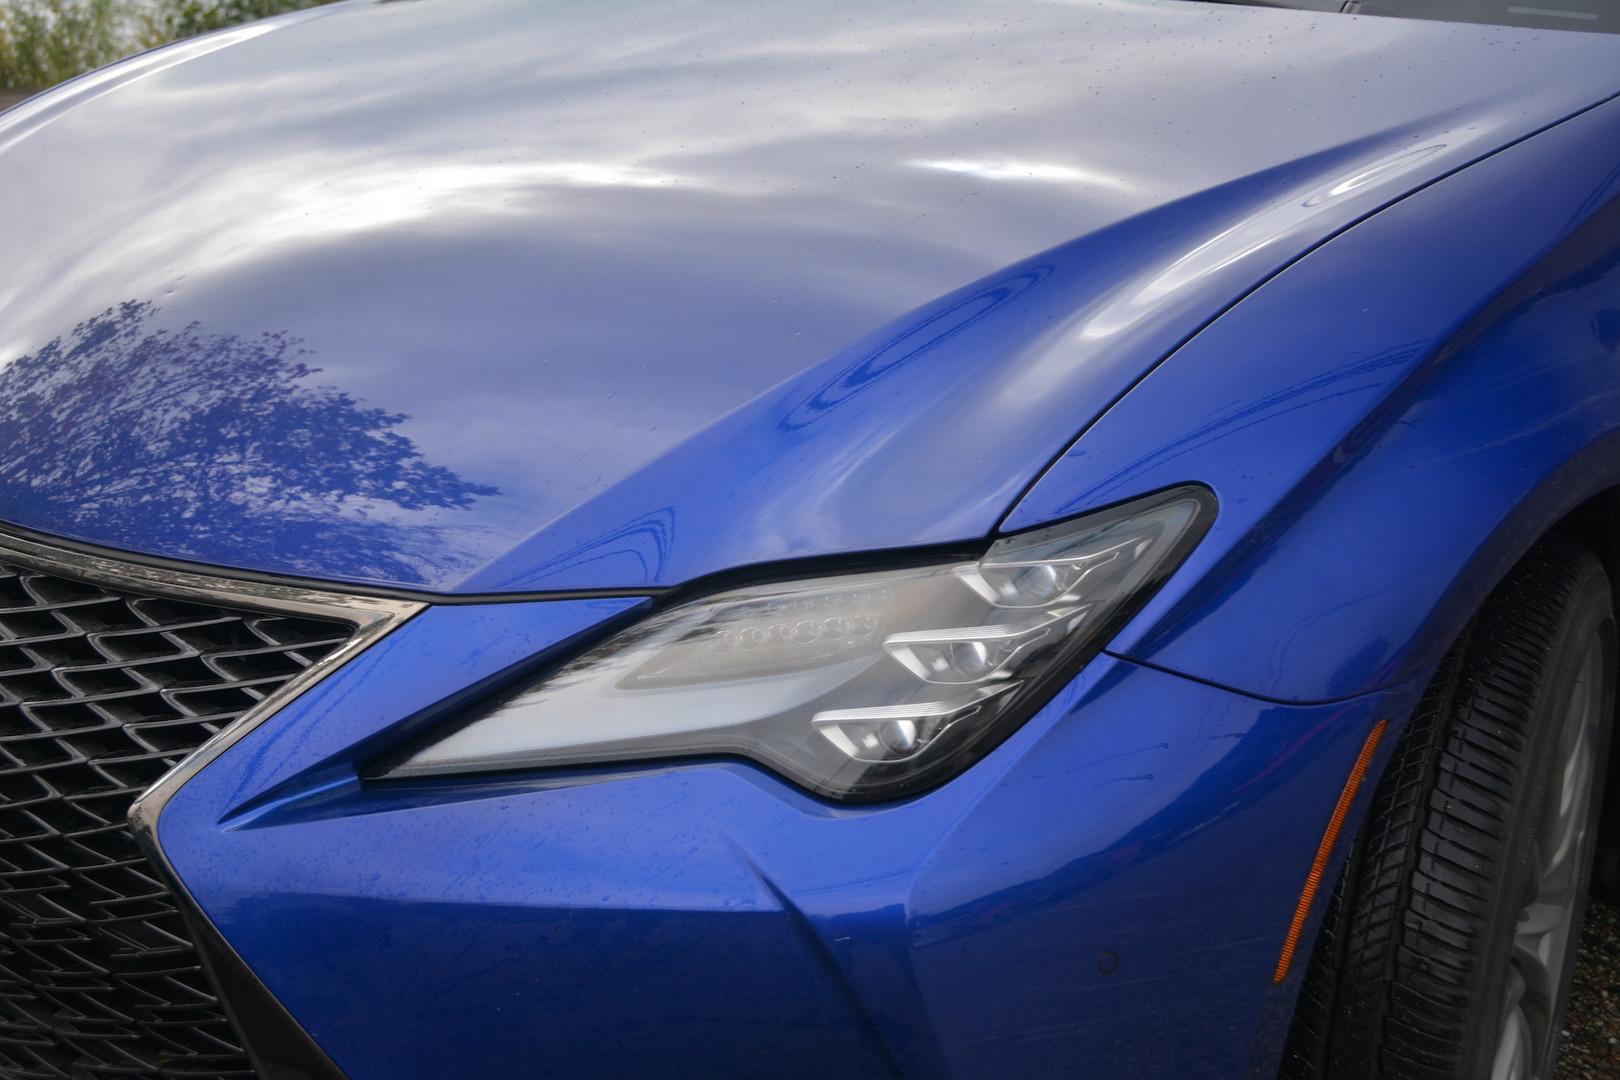 2019 Lexus RC 350 F-Sport Headlight